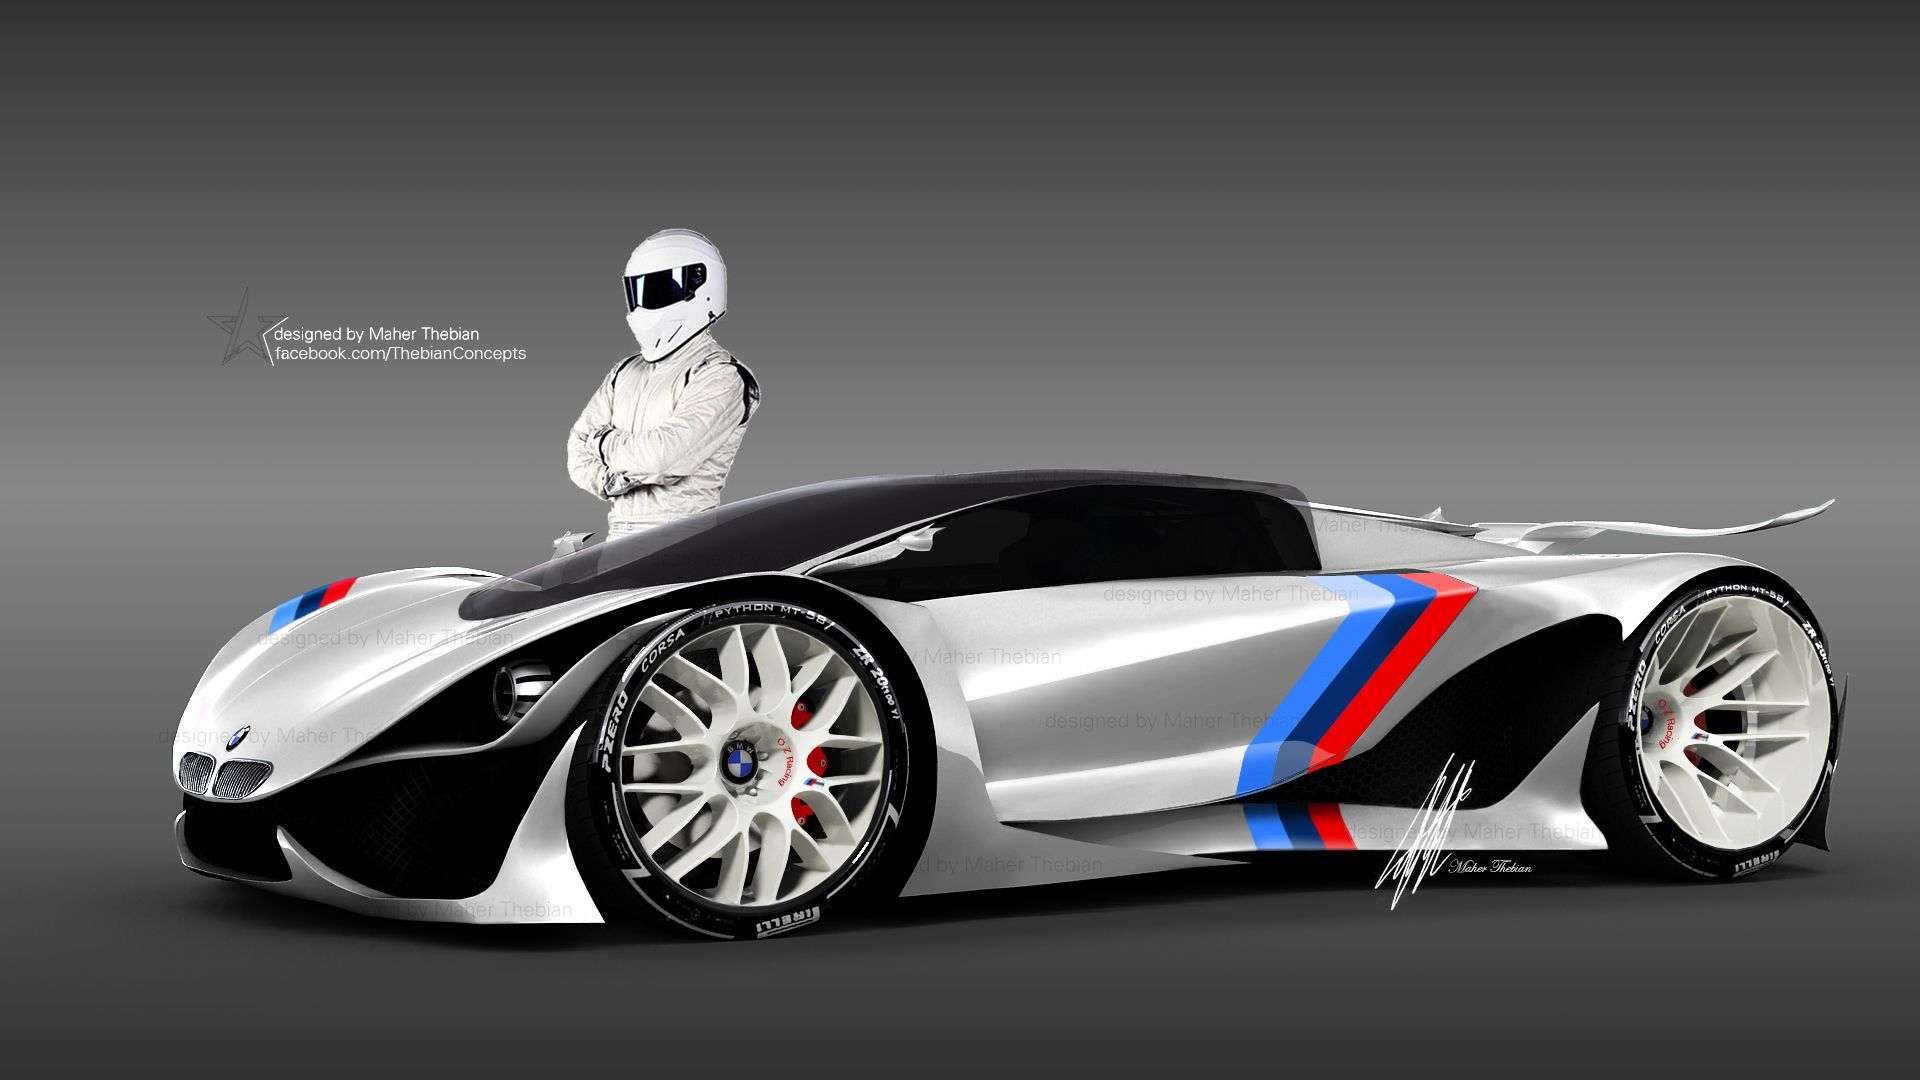 Bmw Mt 58 M Power Concept Fonds D Ecran Arrieres Plan 1920x1080 Id 378305 Concept Cars Fond D Ecran Bmw Bmw